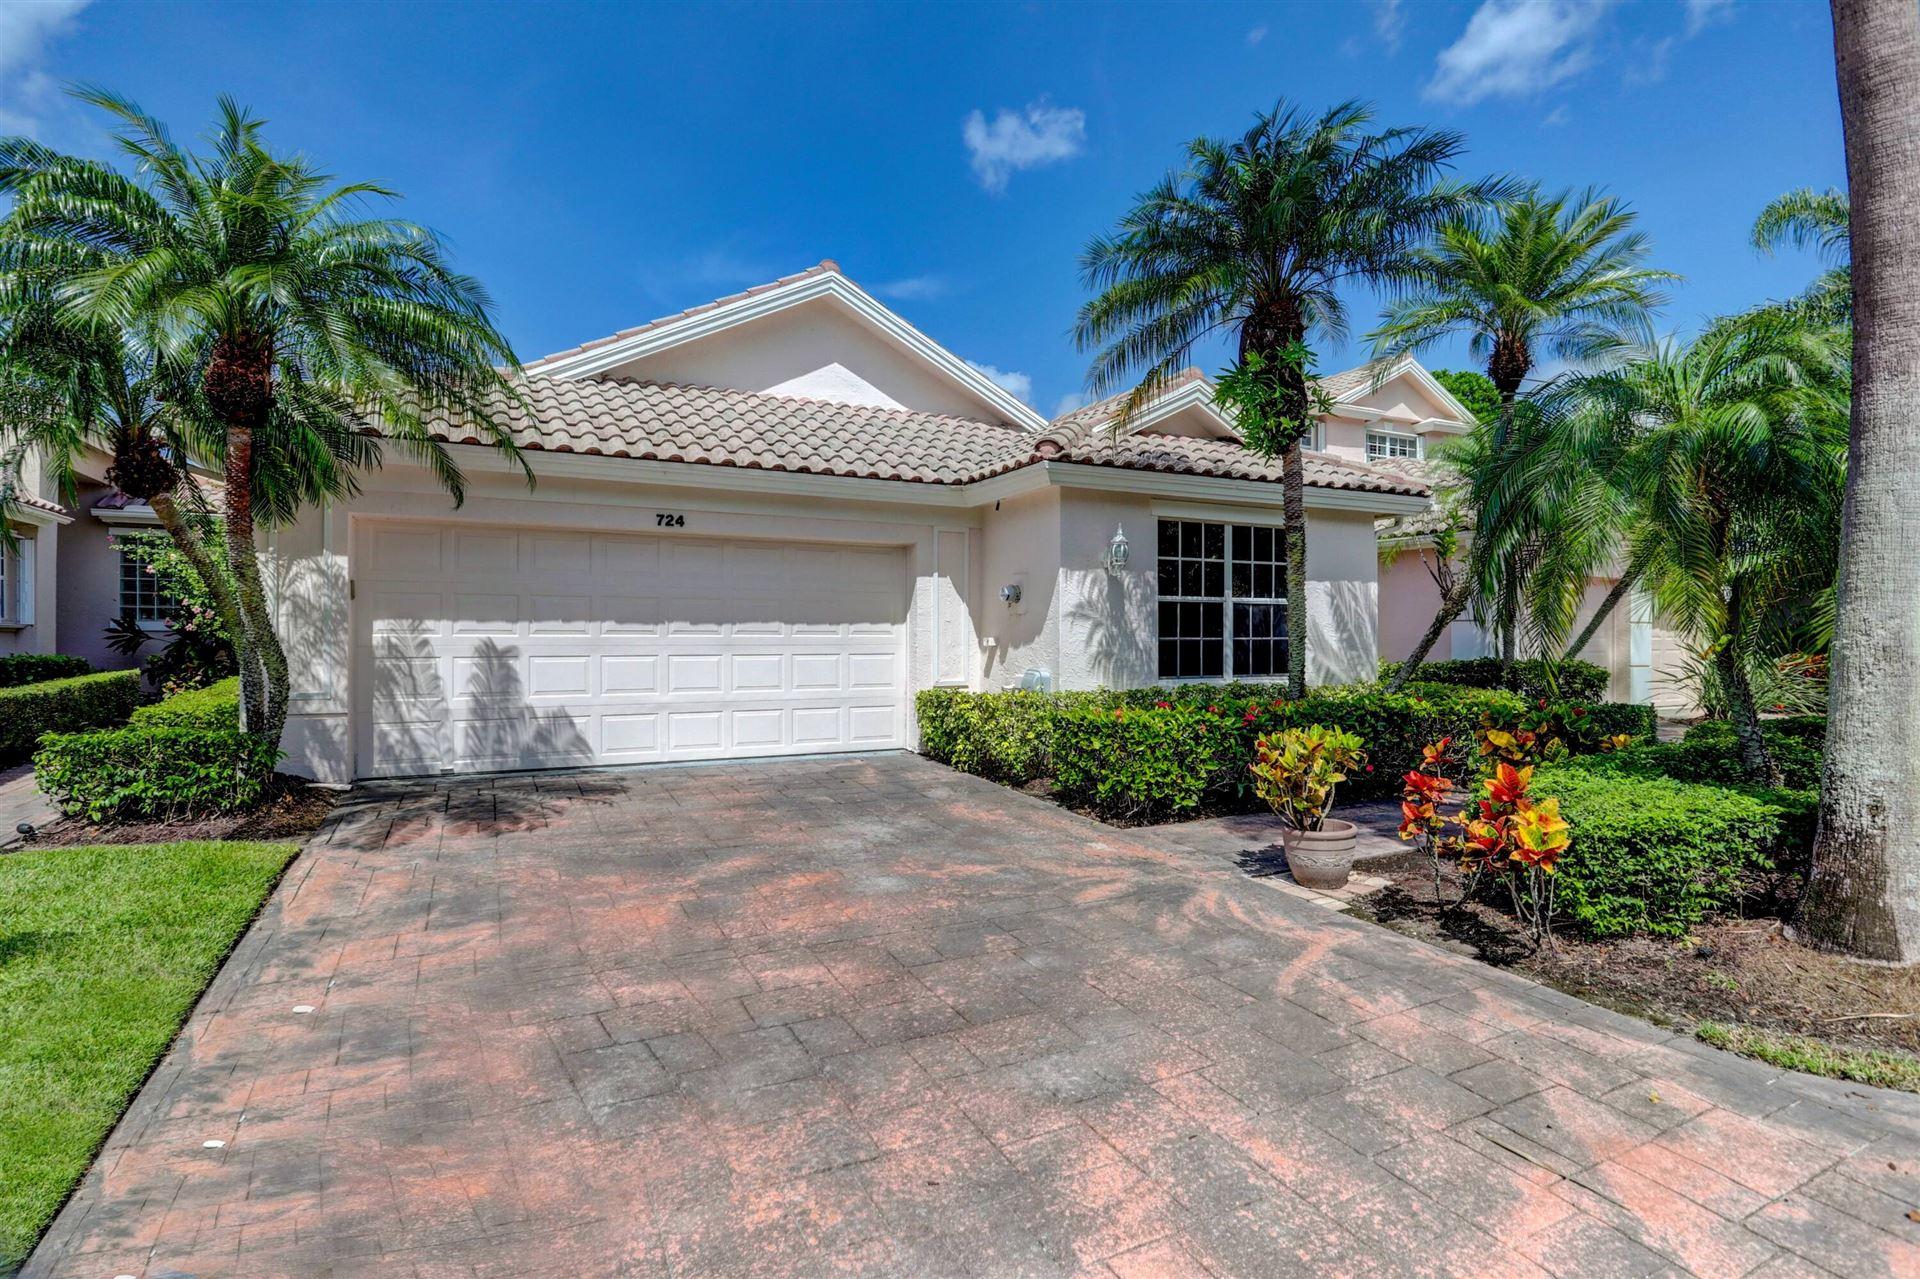 Photo of 724 Pinehurst Way, Palm Beach Gardens, FL 33418 (MLS # RX-10735222)